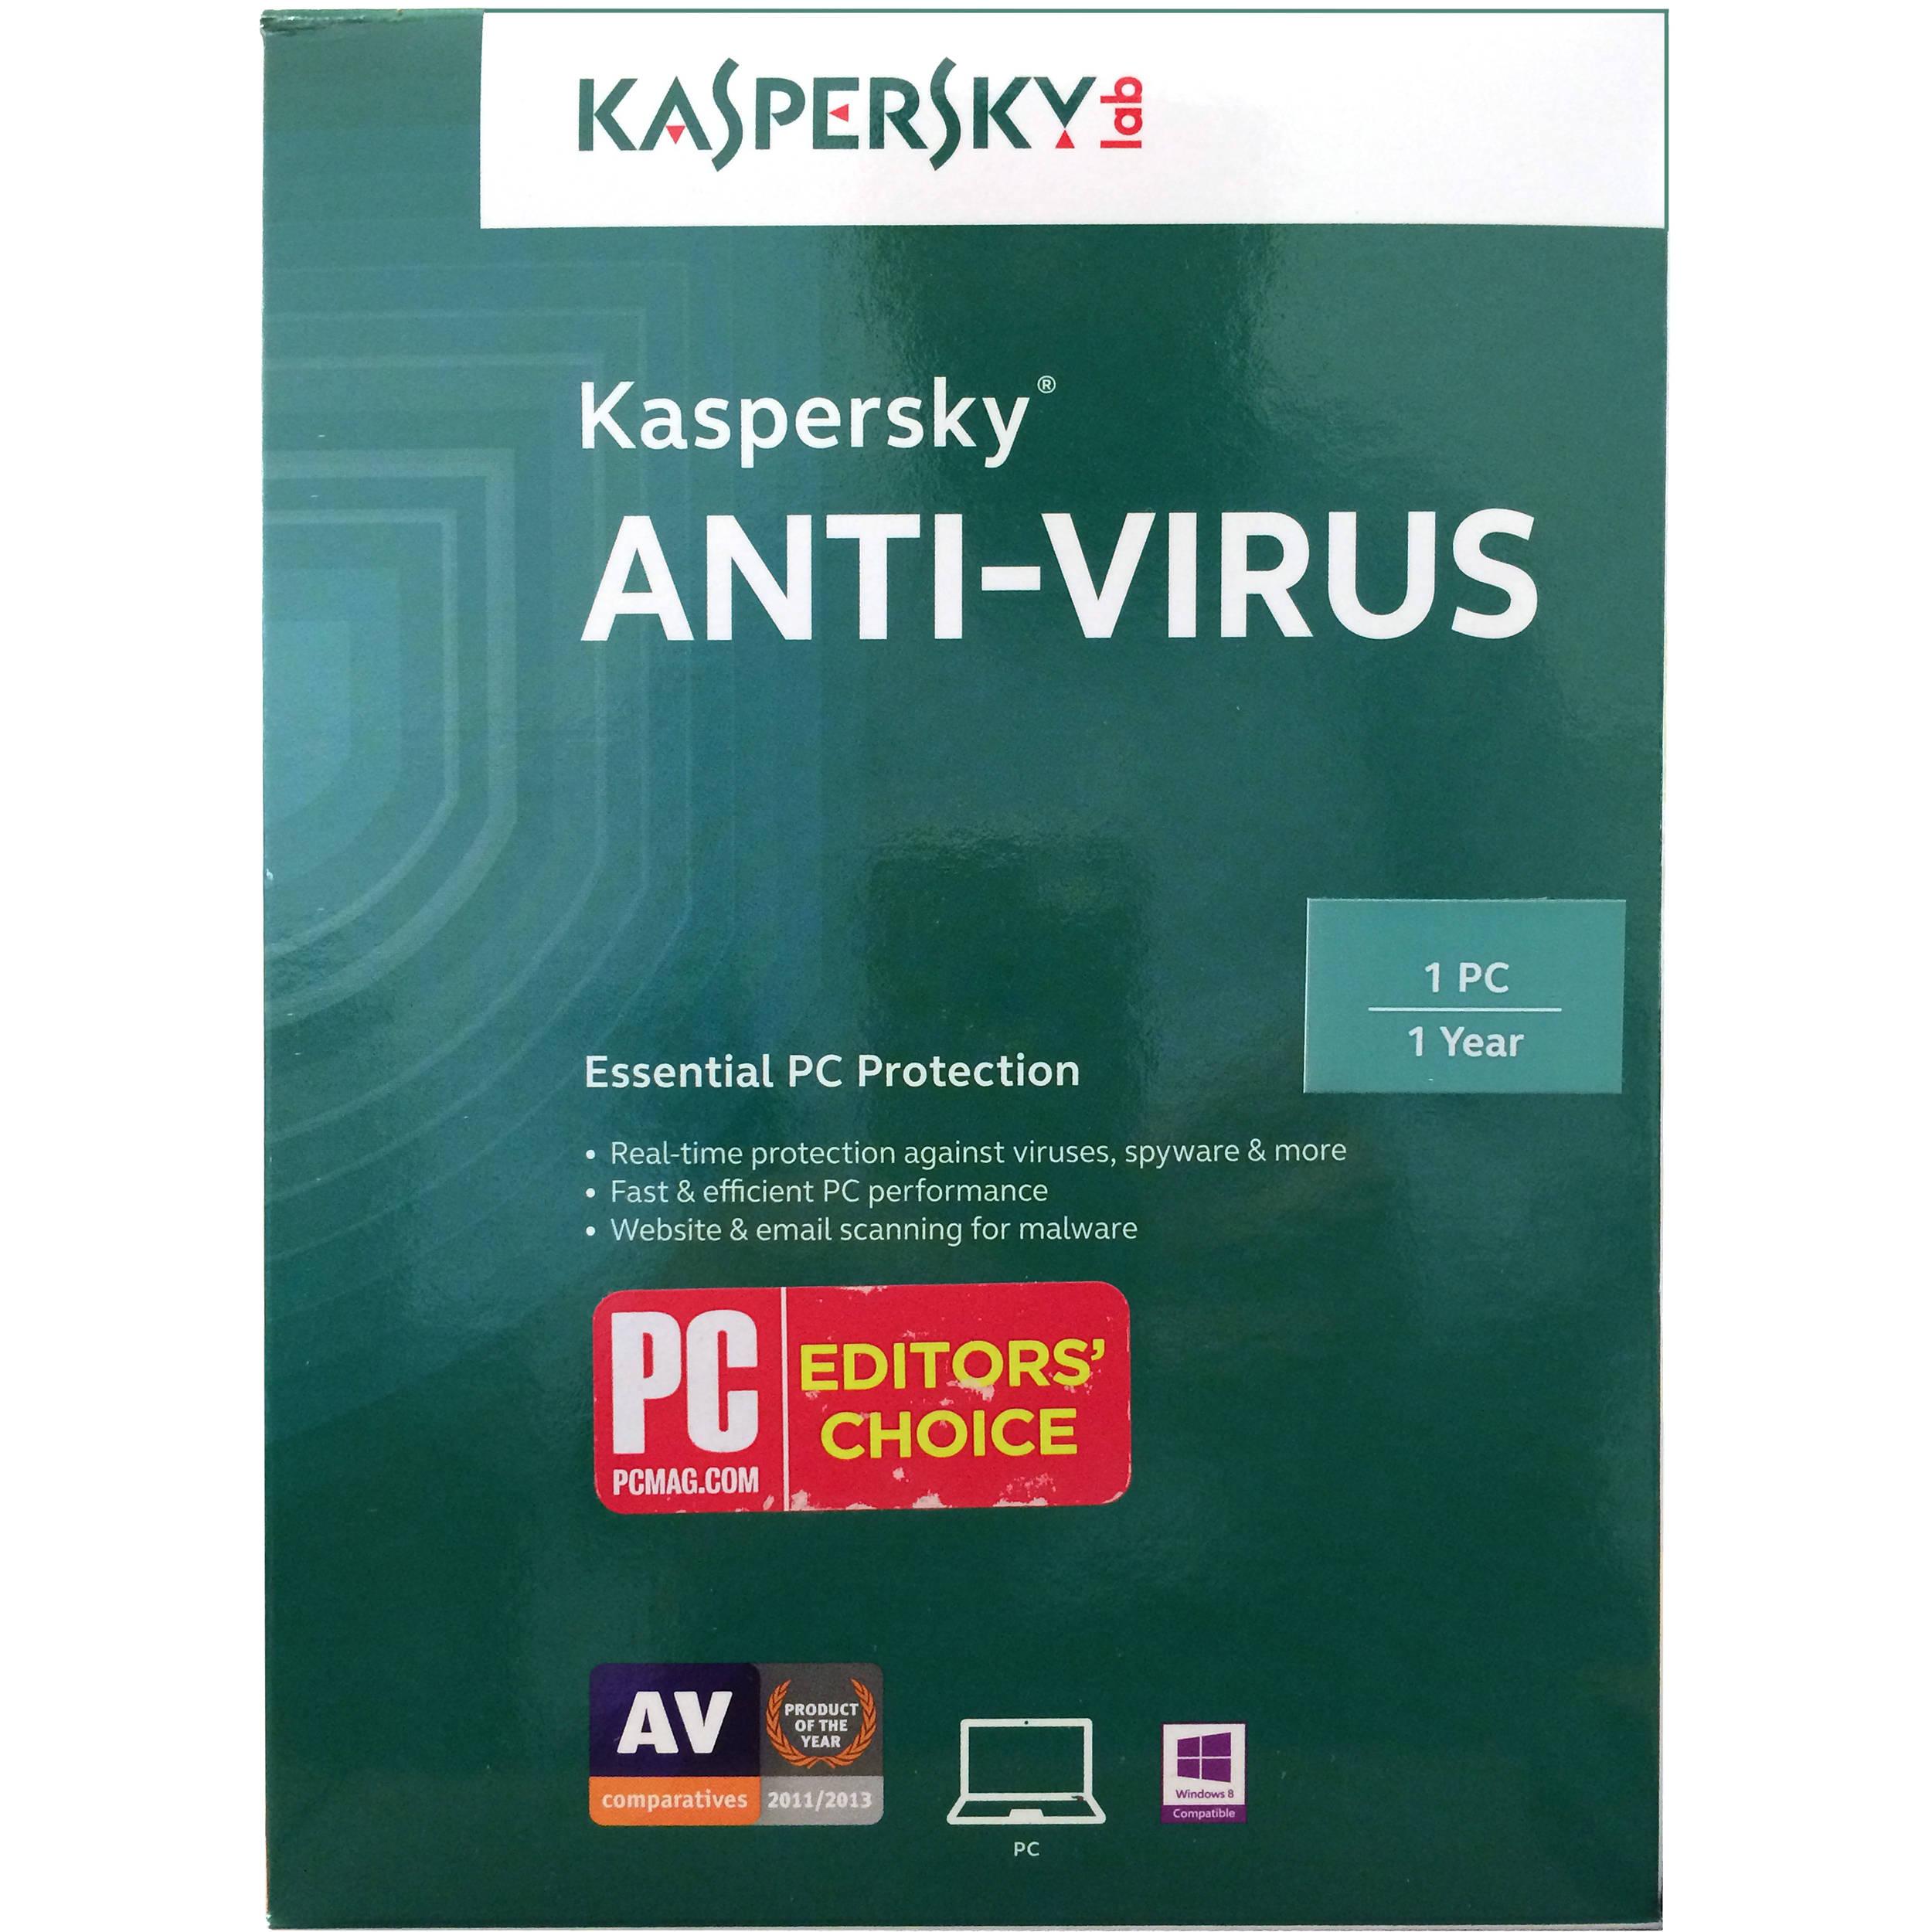 Kaspersky Anti-Virus 2016 KL1167ACAFS B&H Photo Video